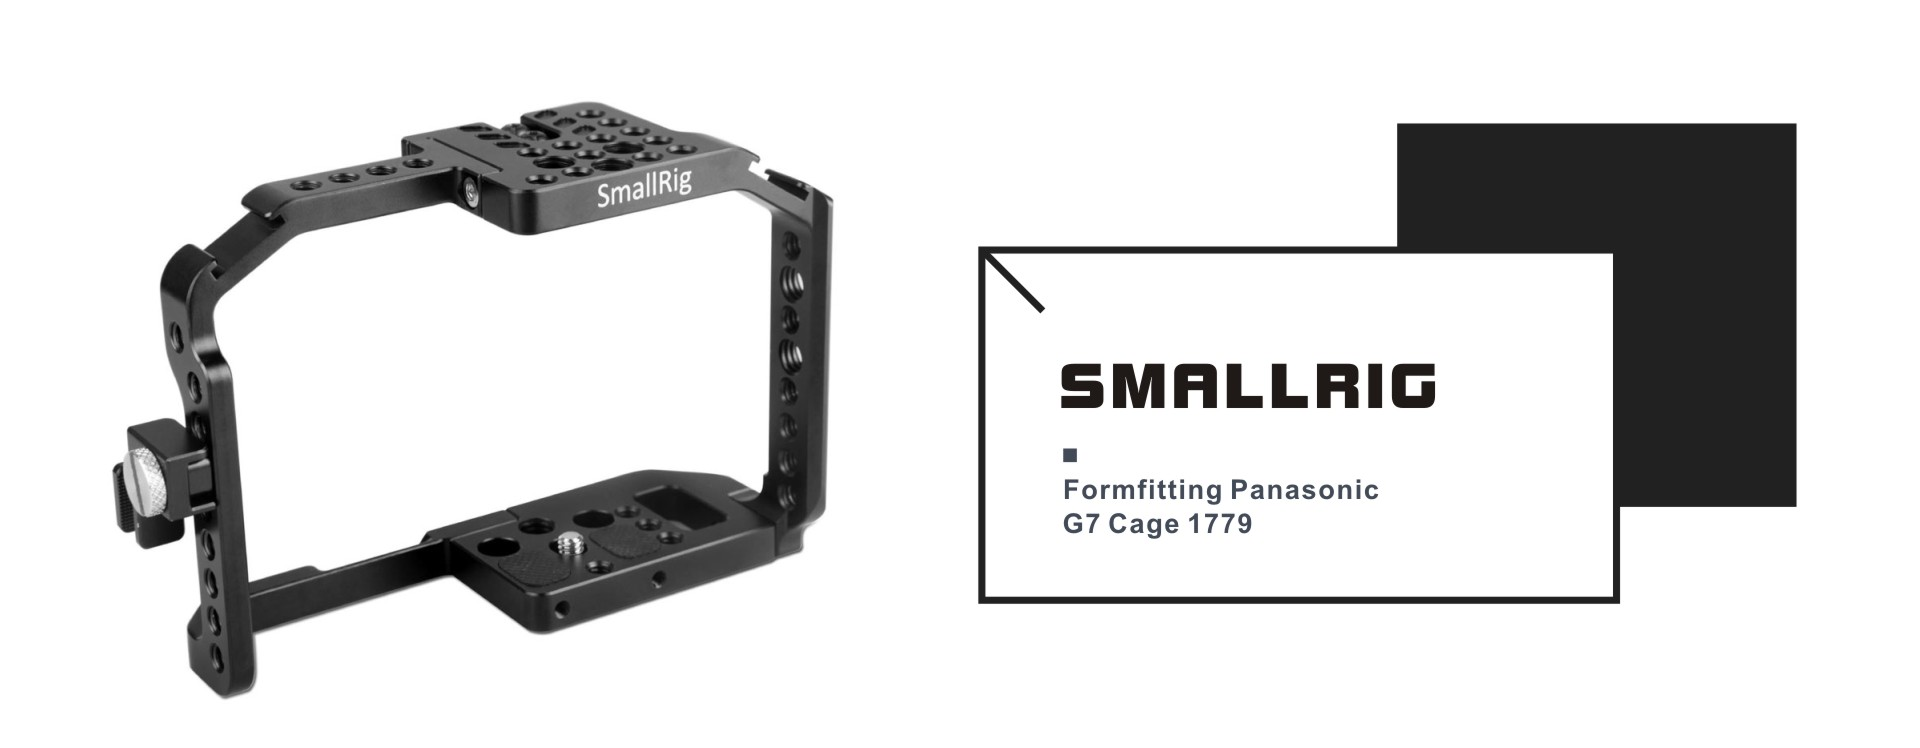 Panasonic G7 Cage 1779